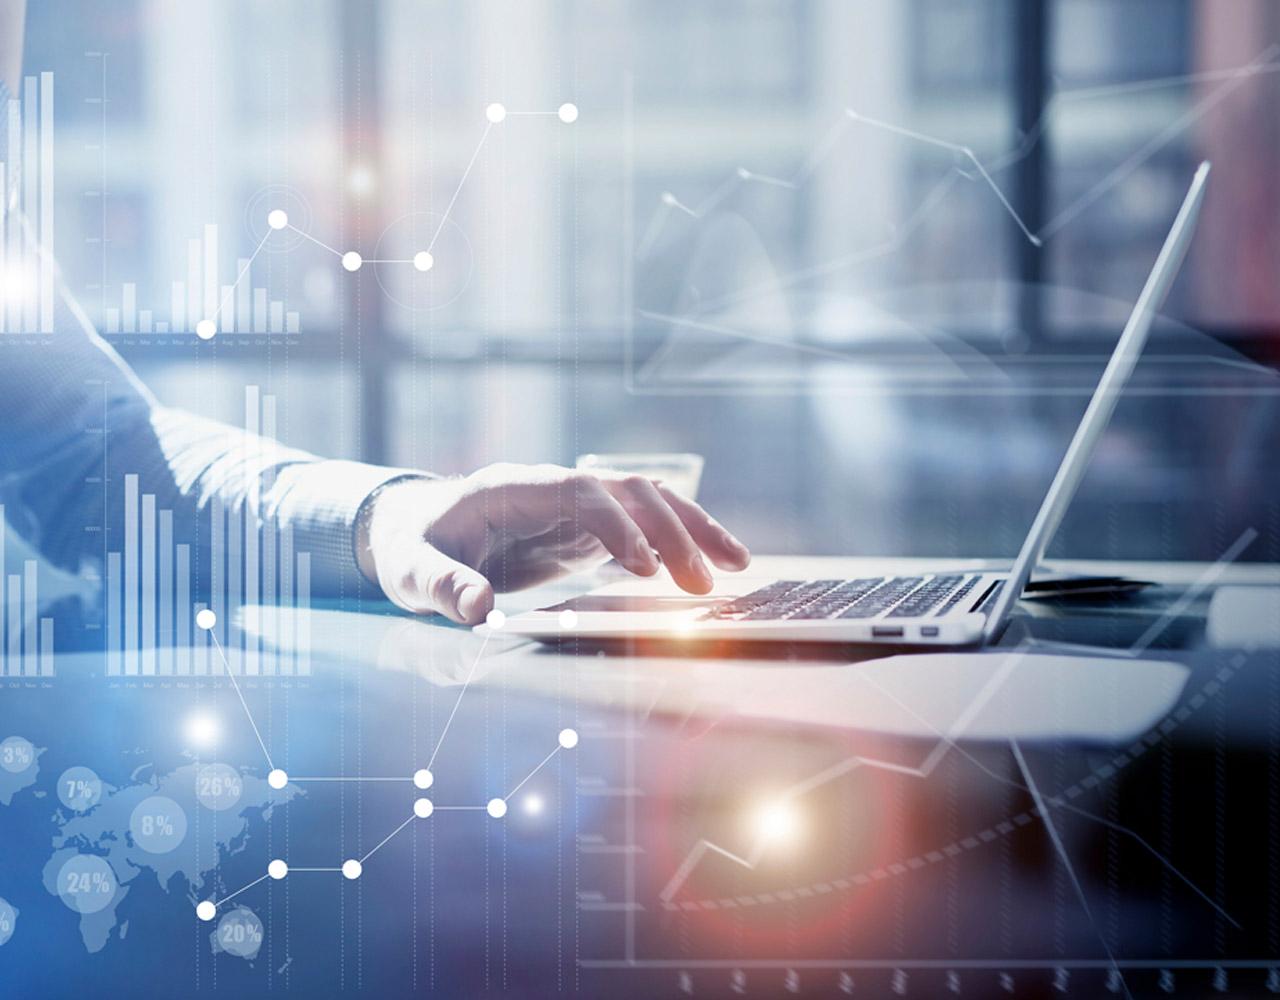 virtualizacion-cloud-computing